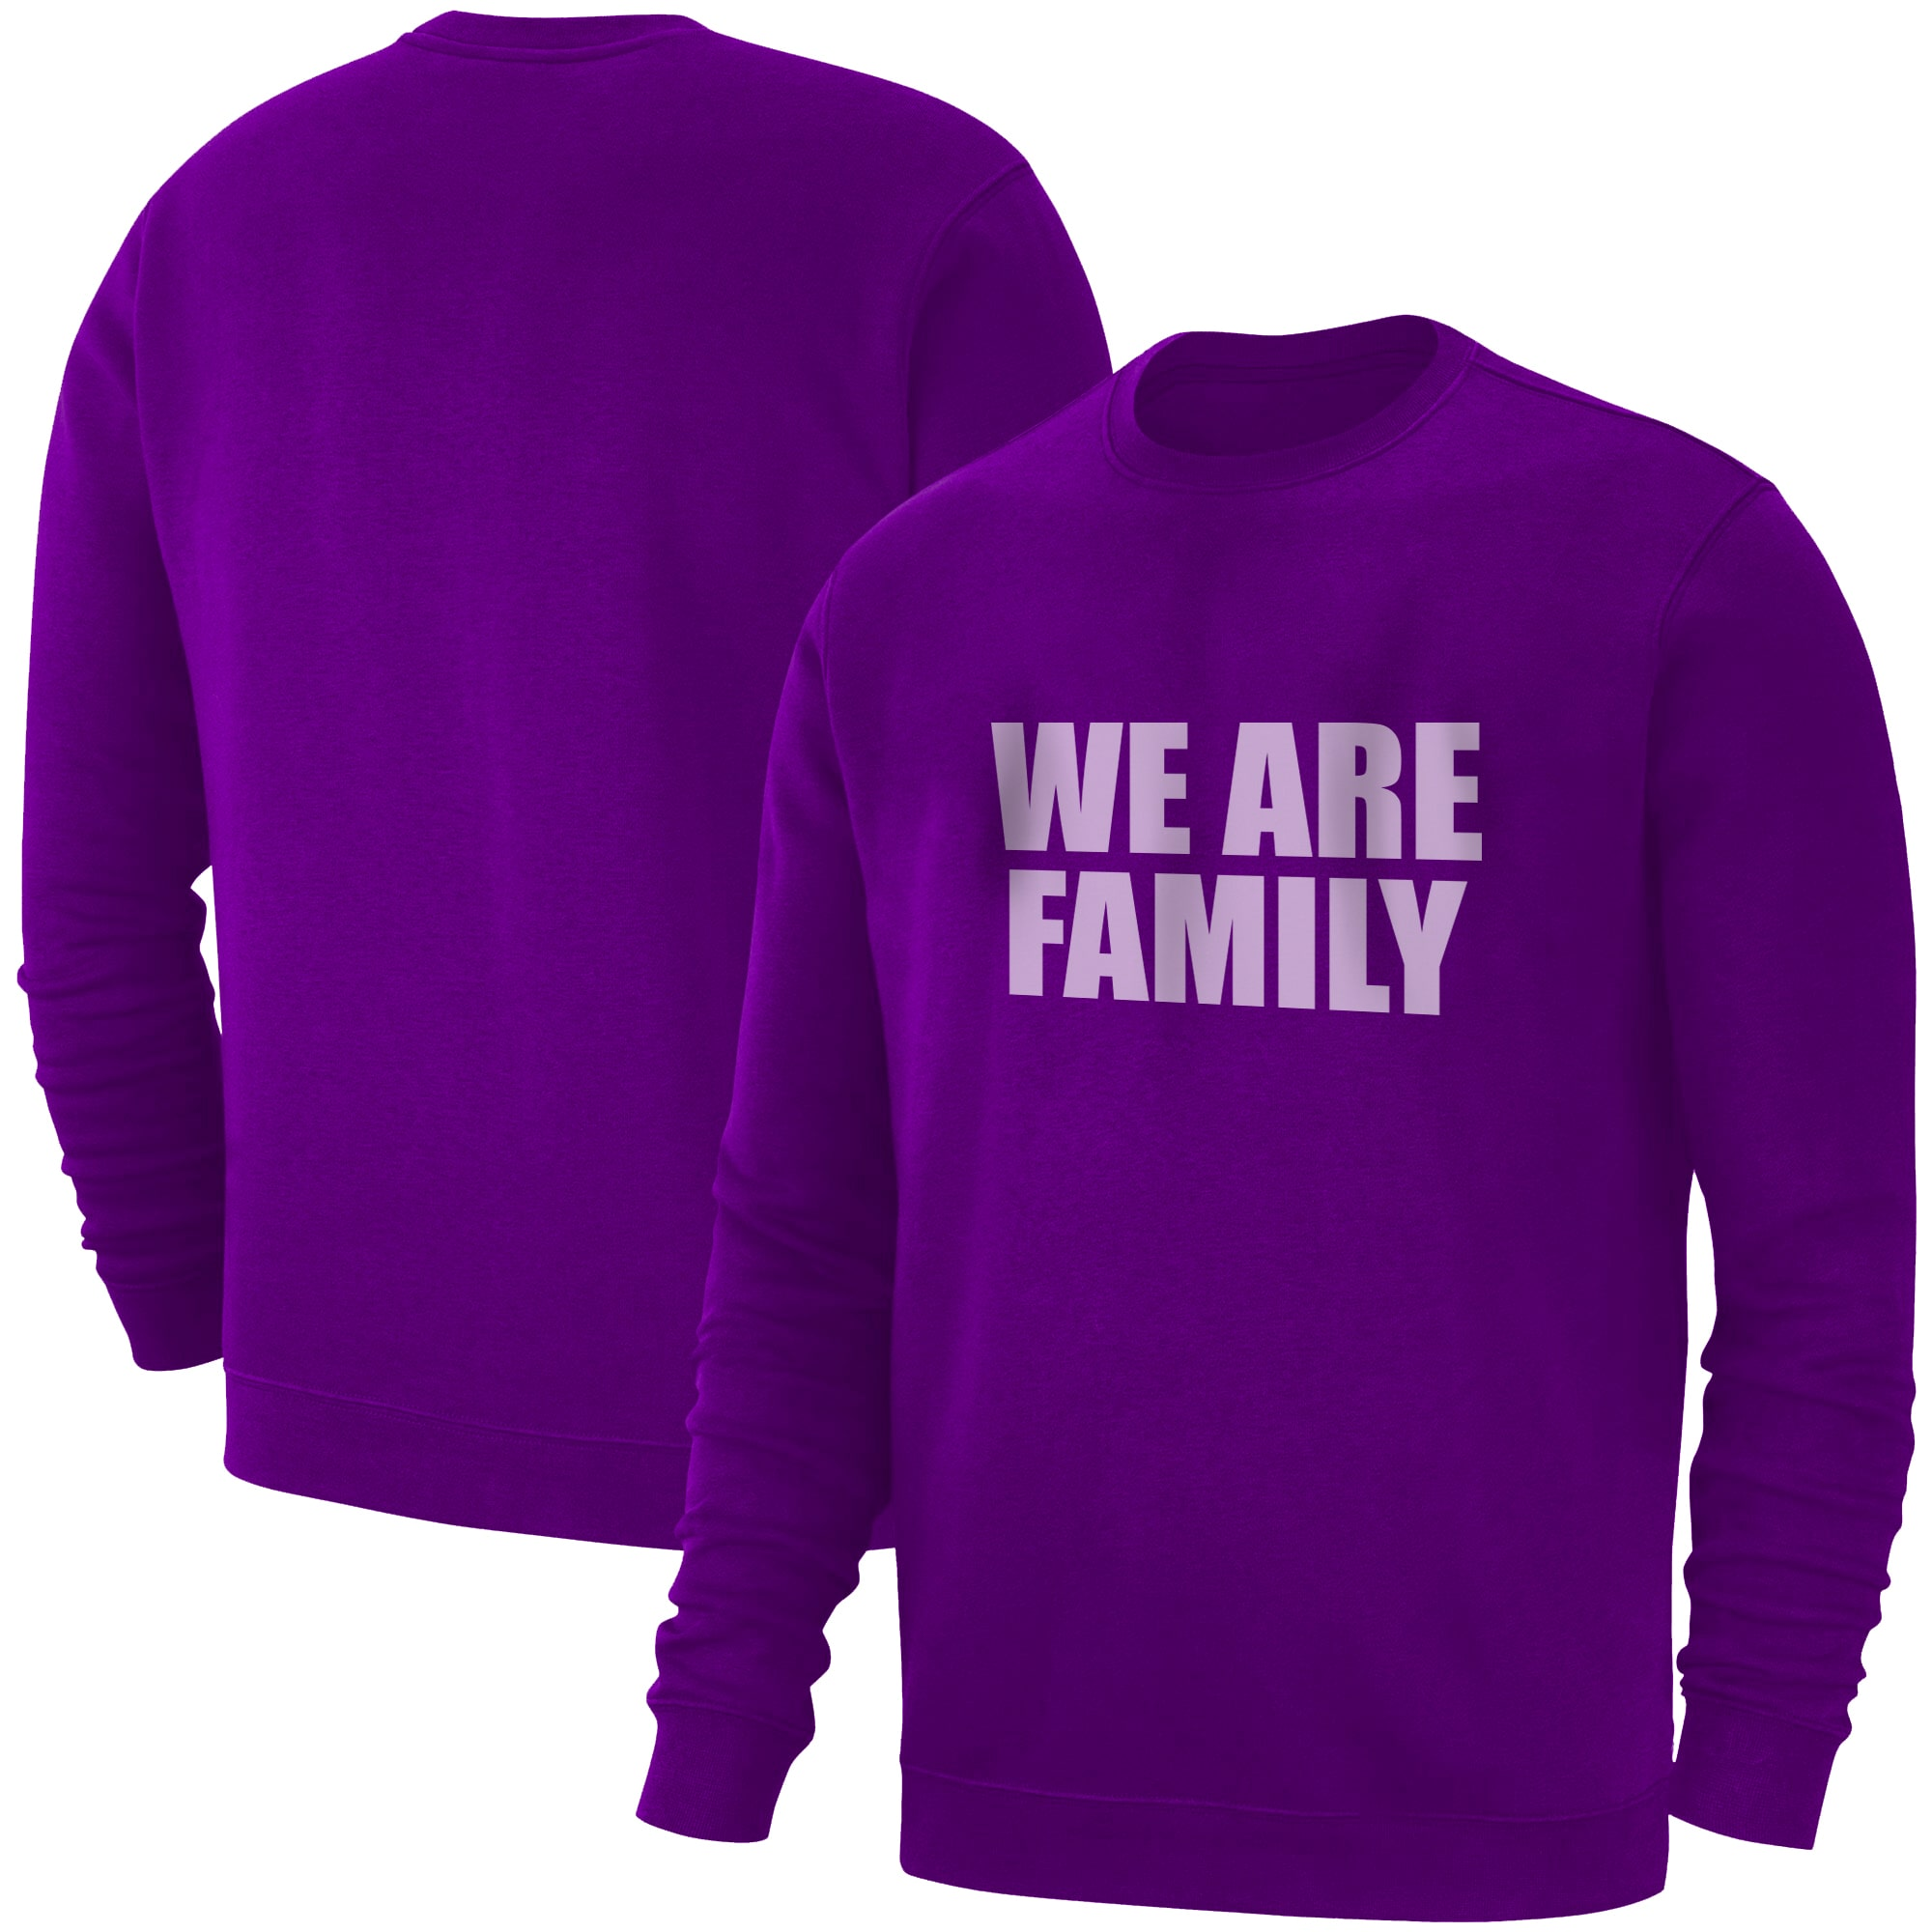 Nba Logo Gear We Are Family Basic (BSC-PRP-308-wefamily-Byz)